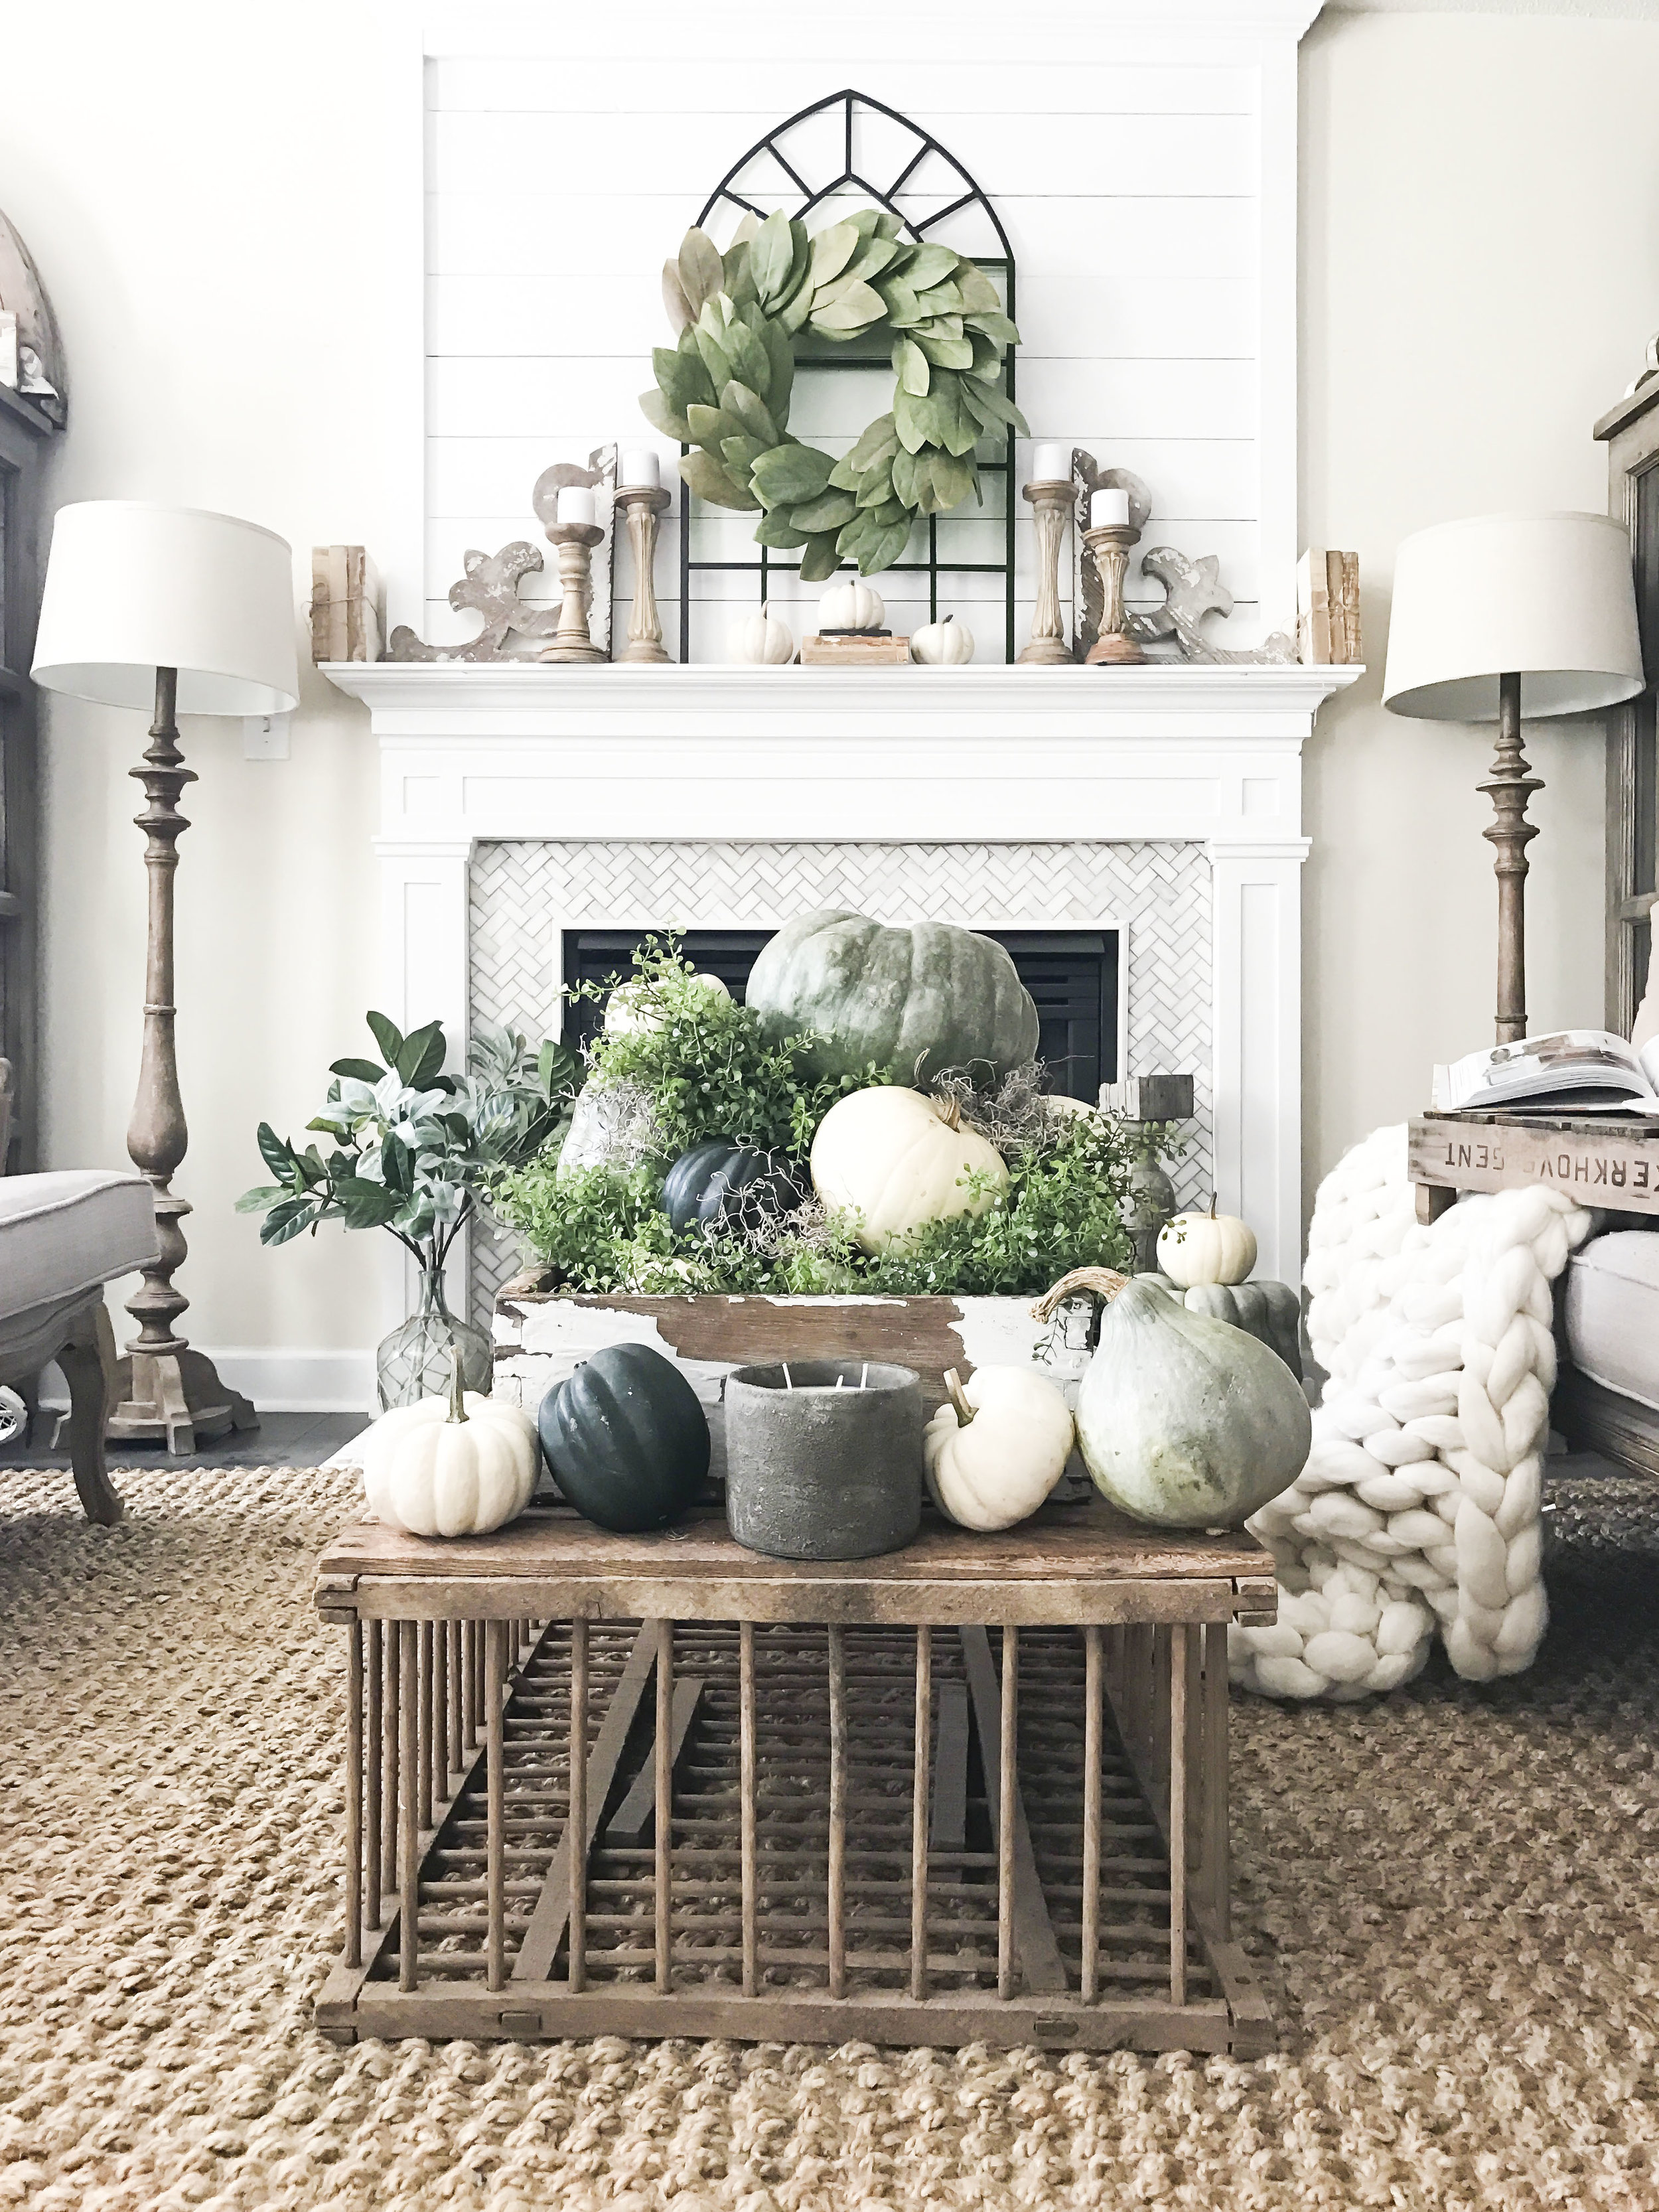 Fall Home Tour inside Plum Pretty Decor and Designs Fall Home- Living Room with a Neutral Fall Design